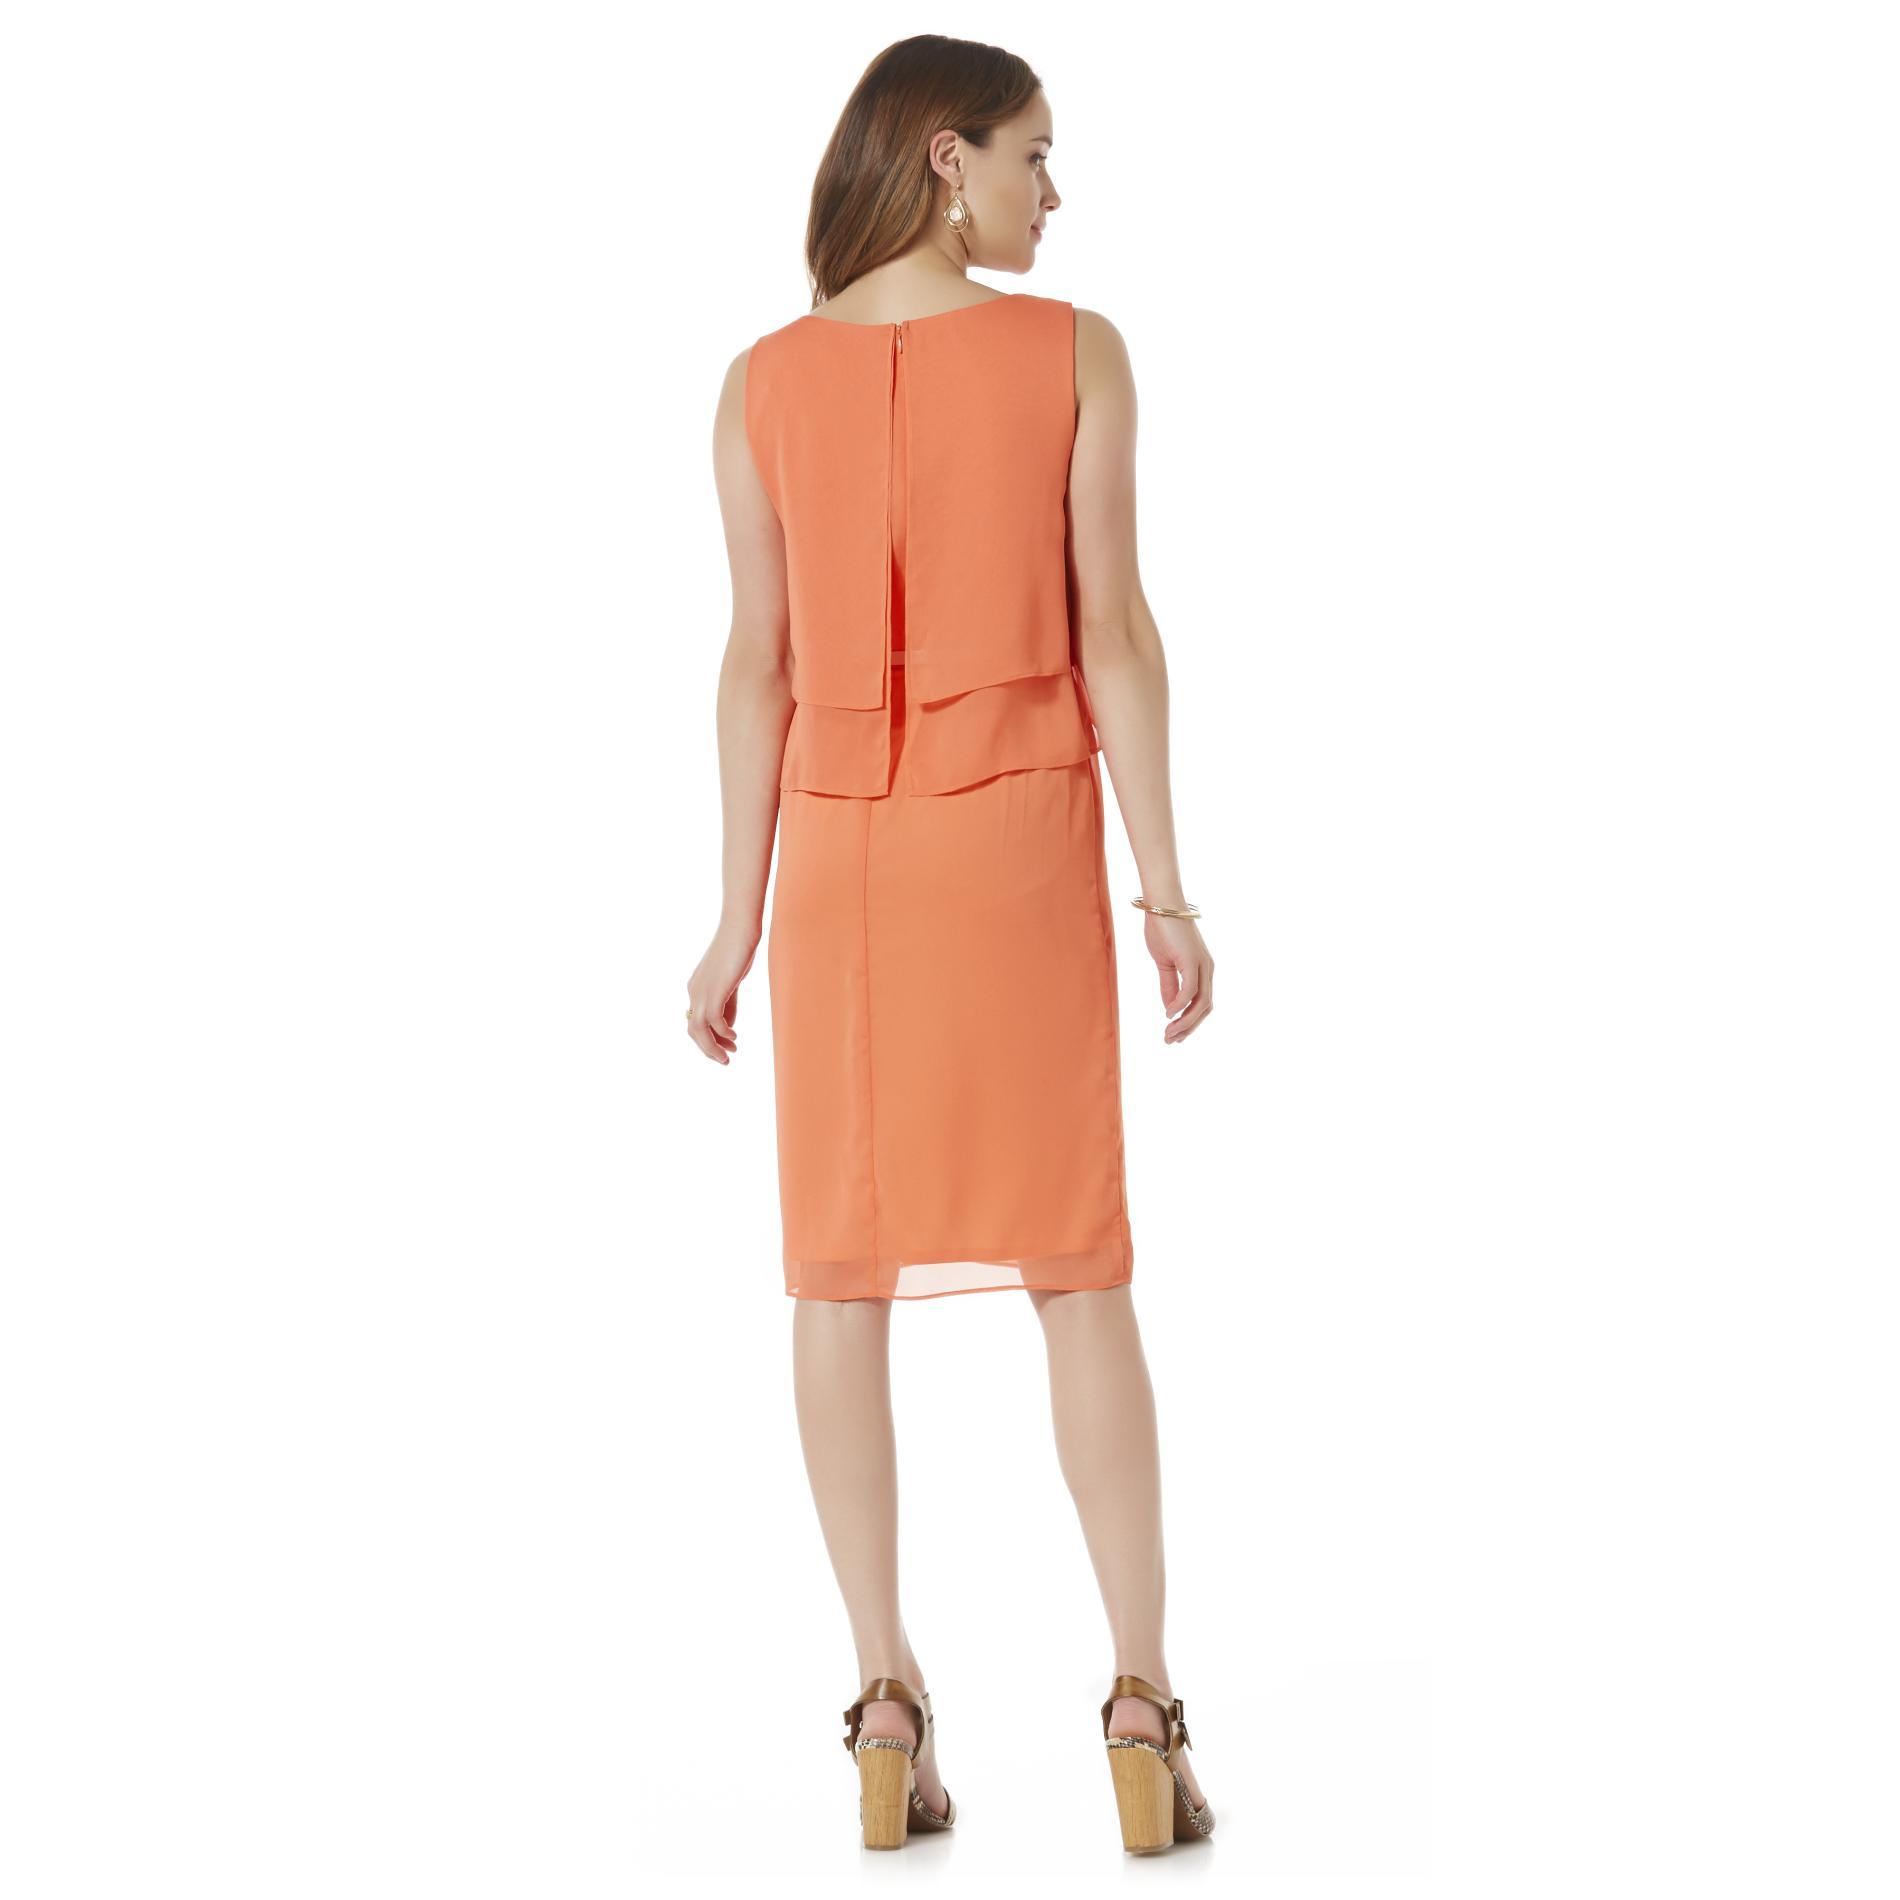 Covington Women's Sleeveless Belted Dress